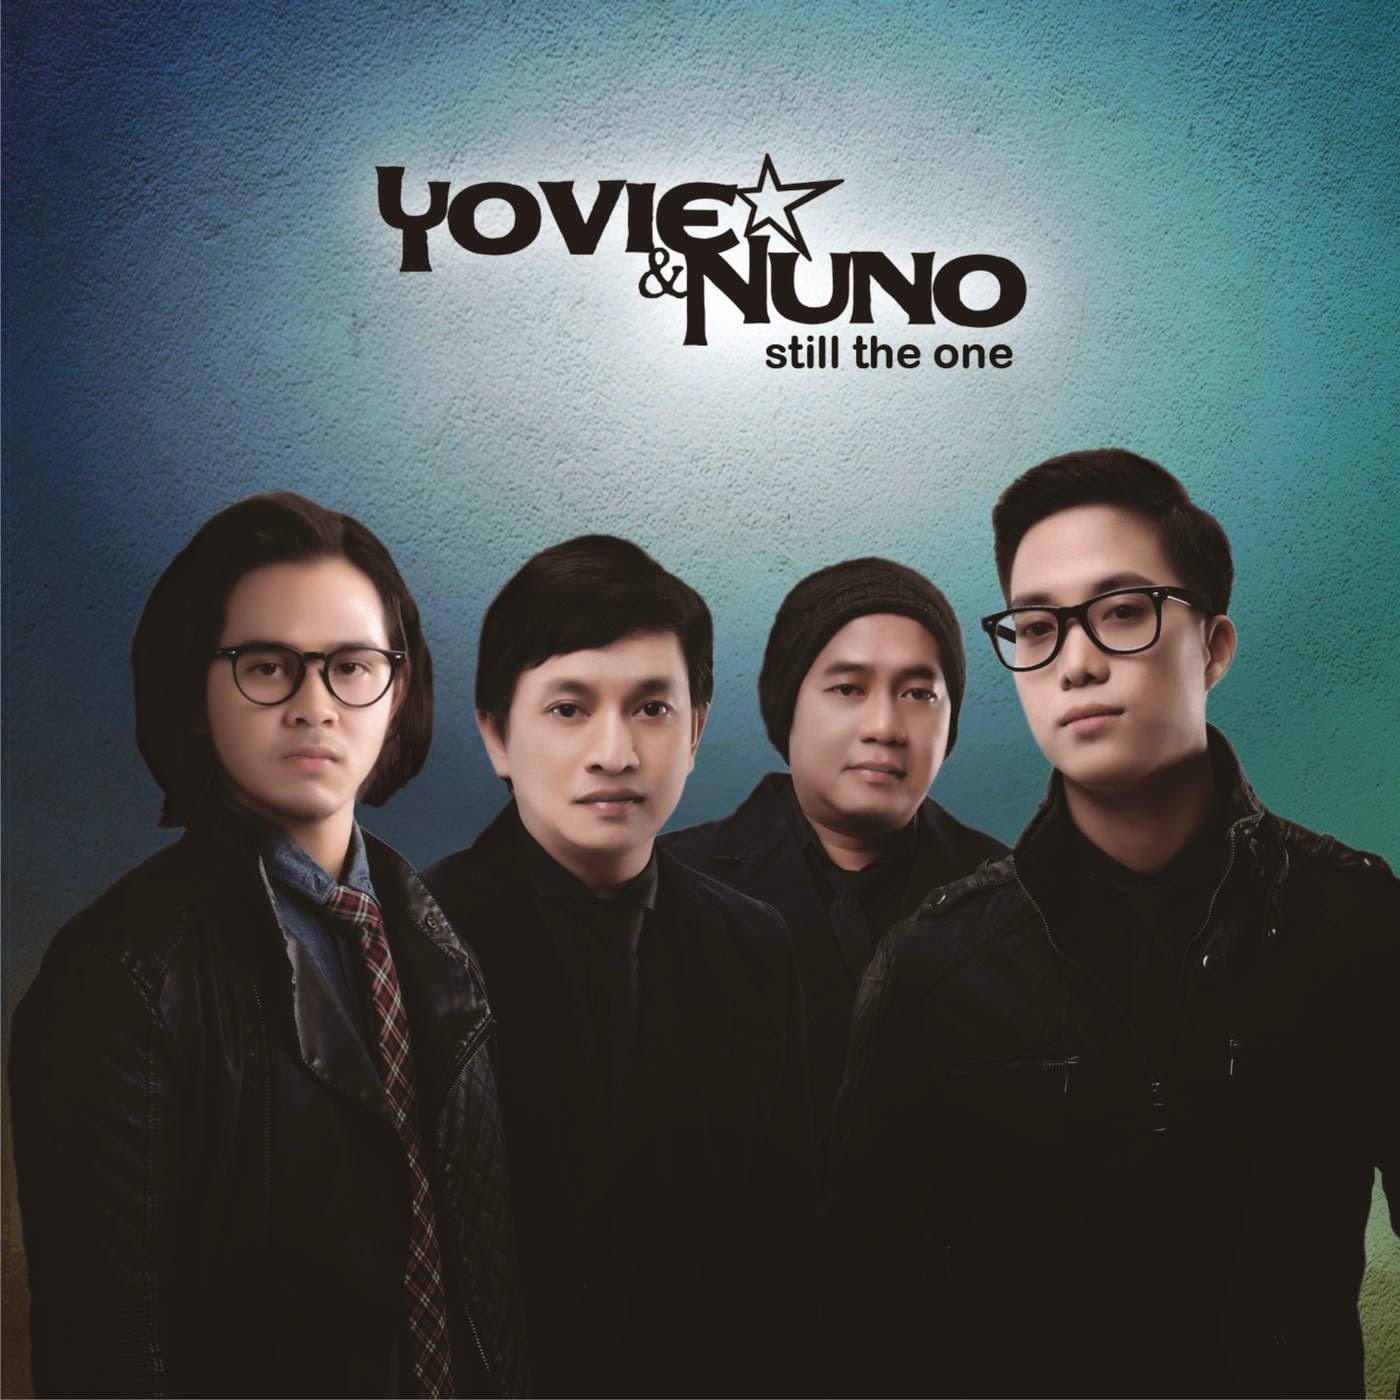 Yovie & Nuno - Tanpa Cinta (from Still the One)